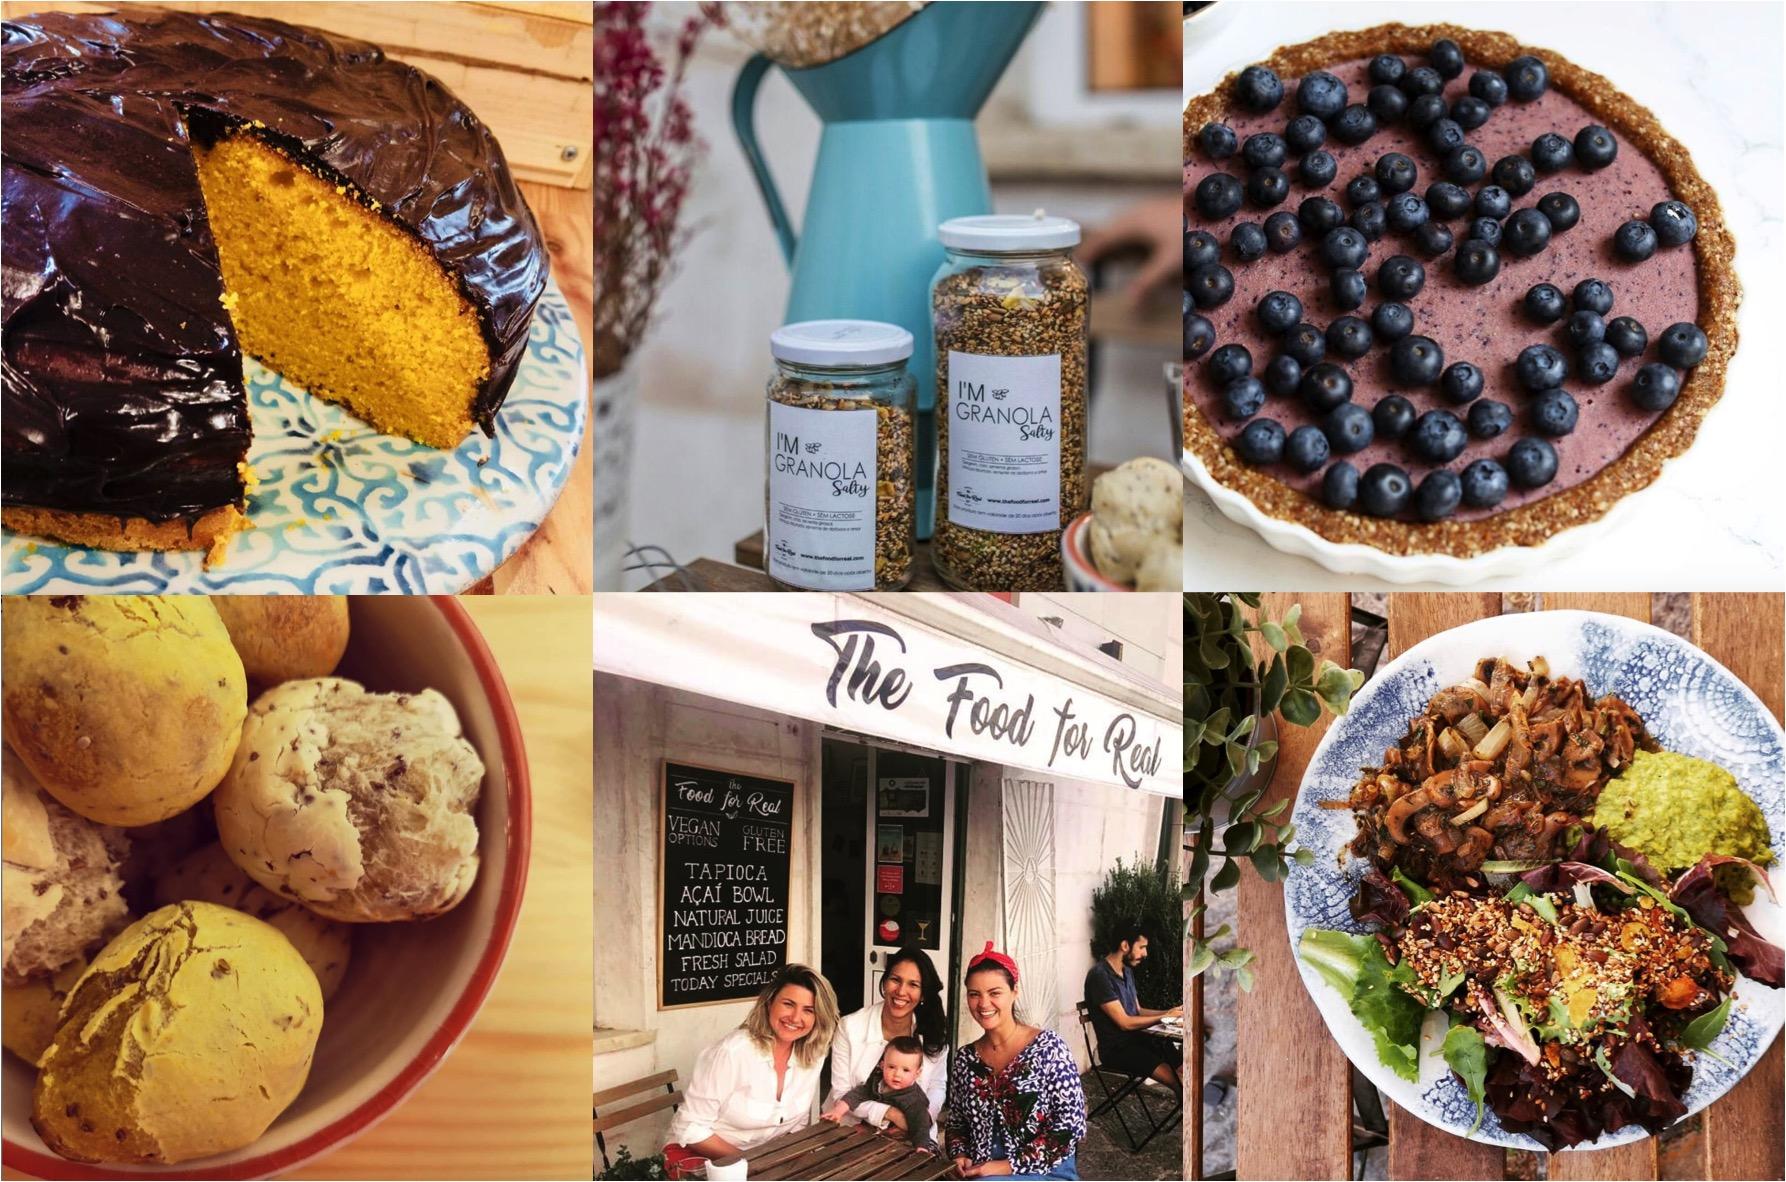 The Food for Real - cafe Alcantara - Lisboa - Portugal